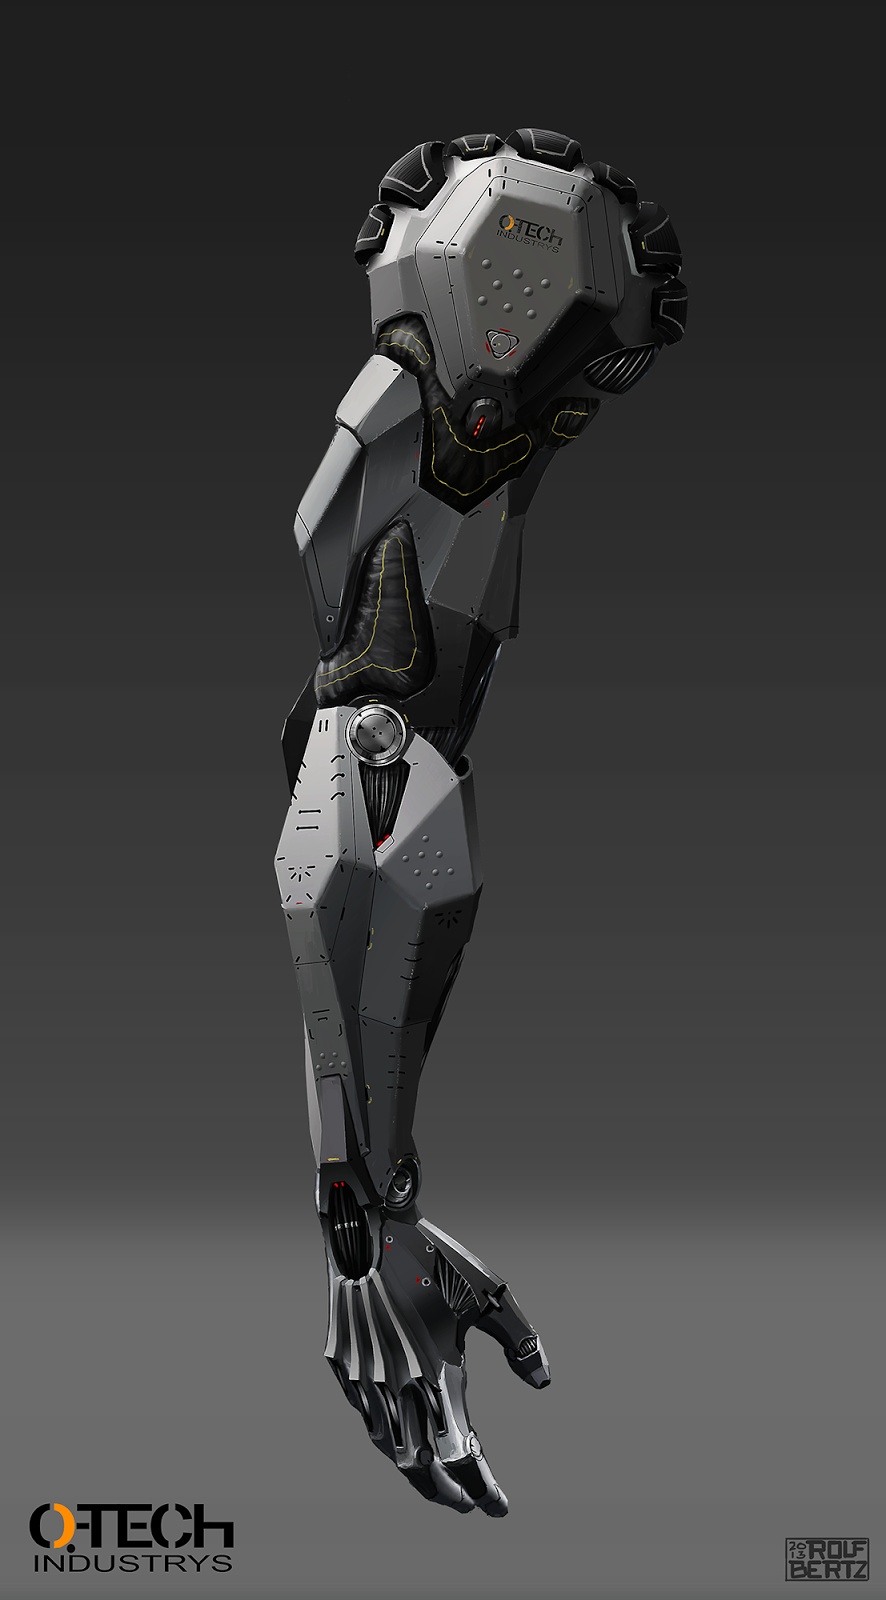 rolf bertz 39 s infantery mech hand cyberarms pinterest roboter konzept kunst und r stungen. Black Bedroom Furniture Sets. Home Design Ideas